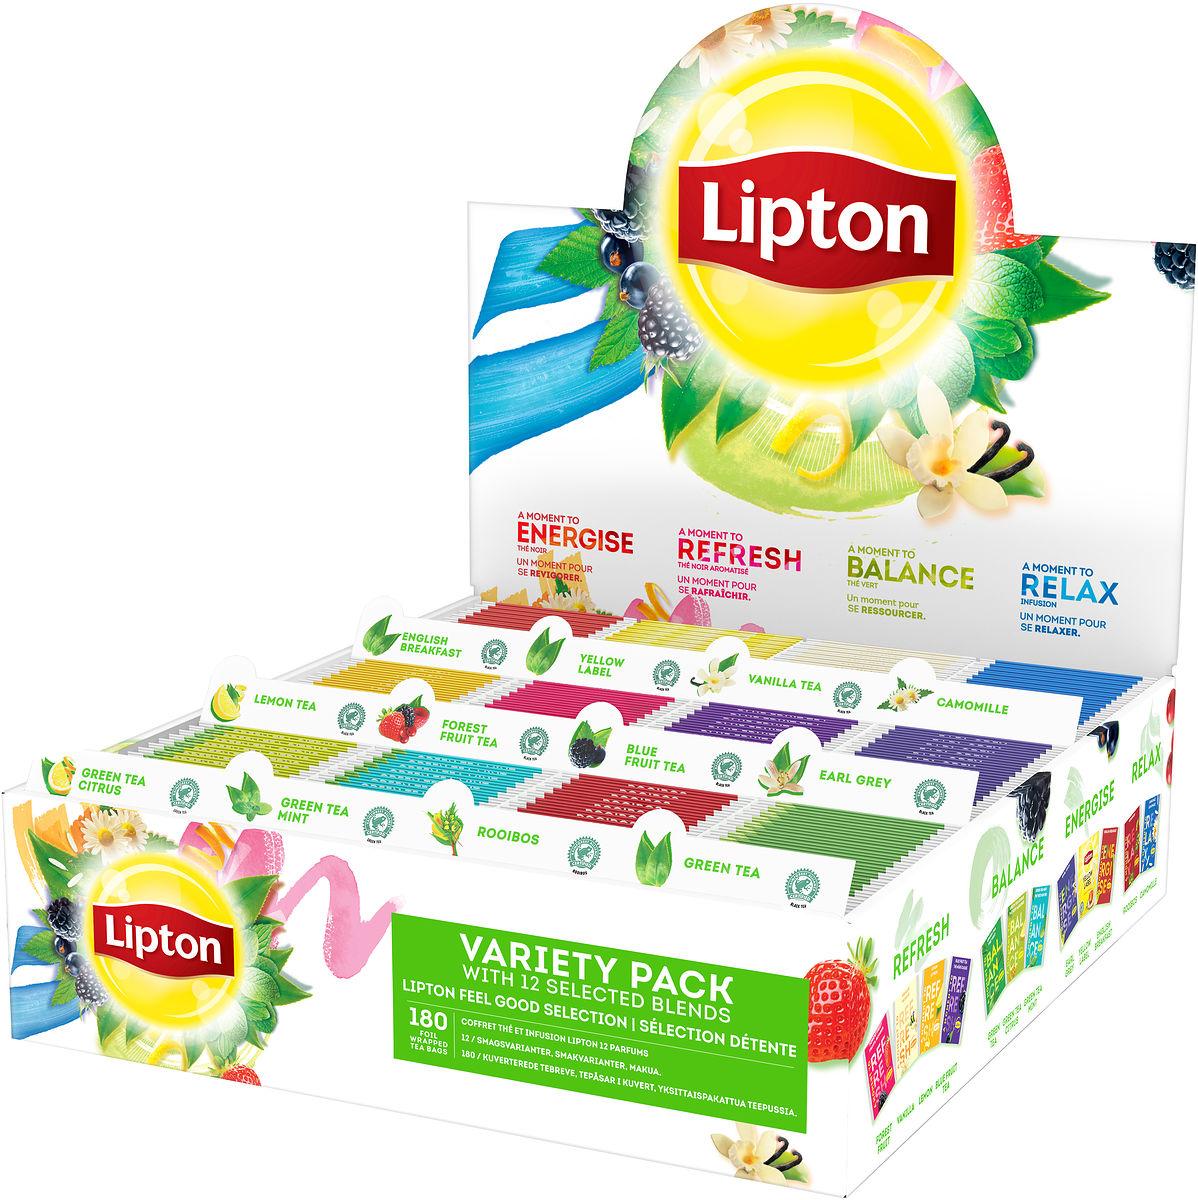 Lipton Medium Designer Ribbed Glass Jar Filled with 45 Lipton tea bags, Caddy